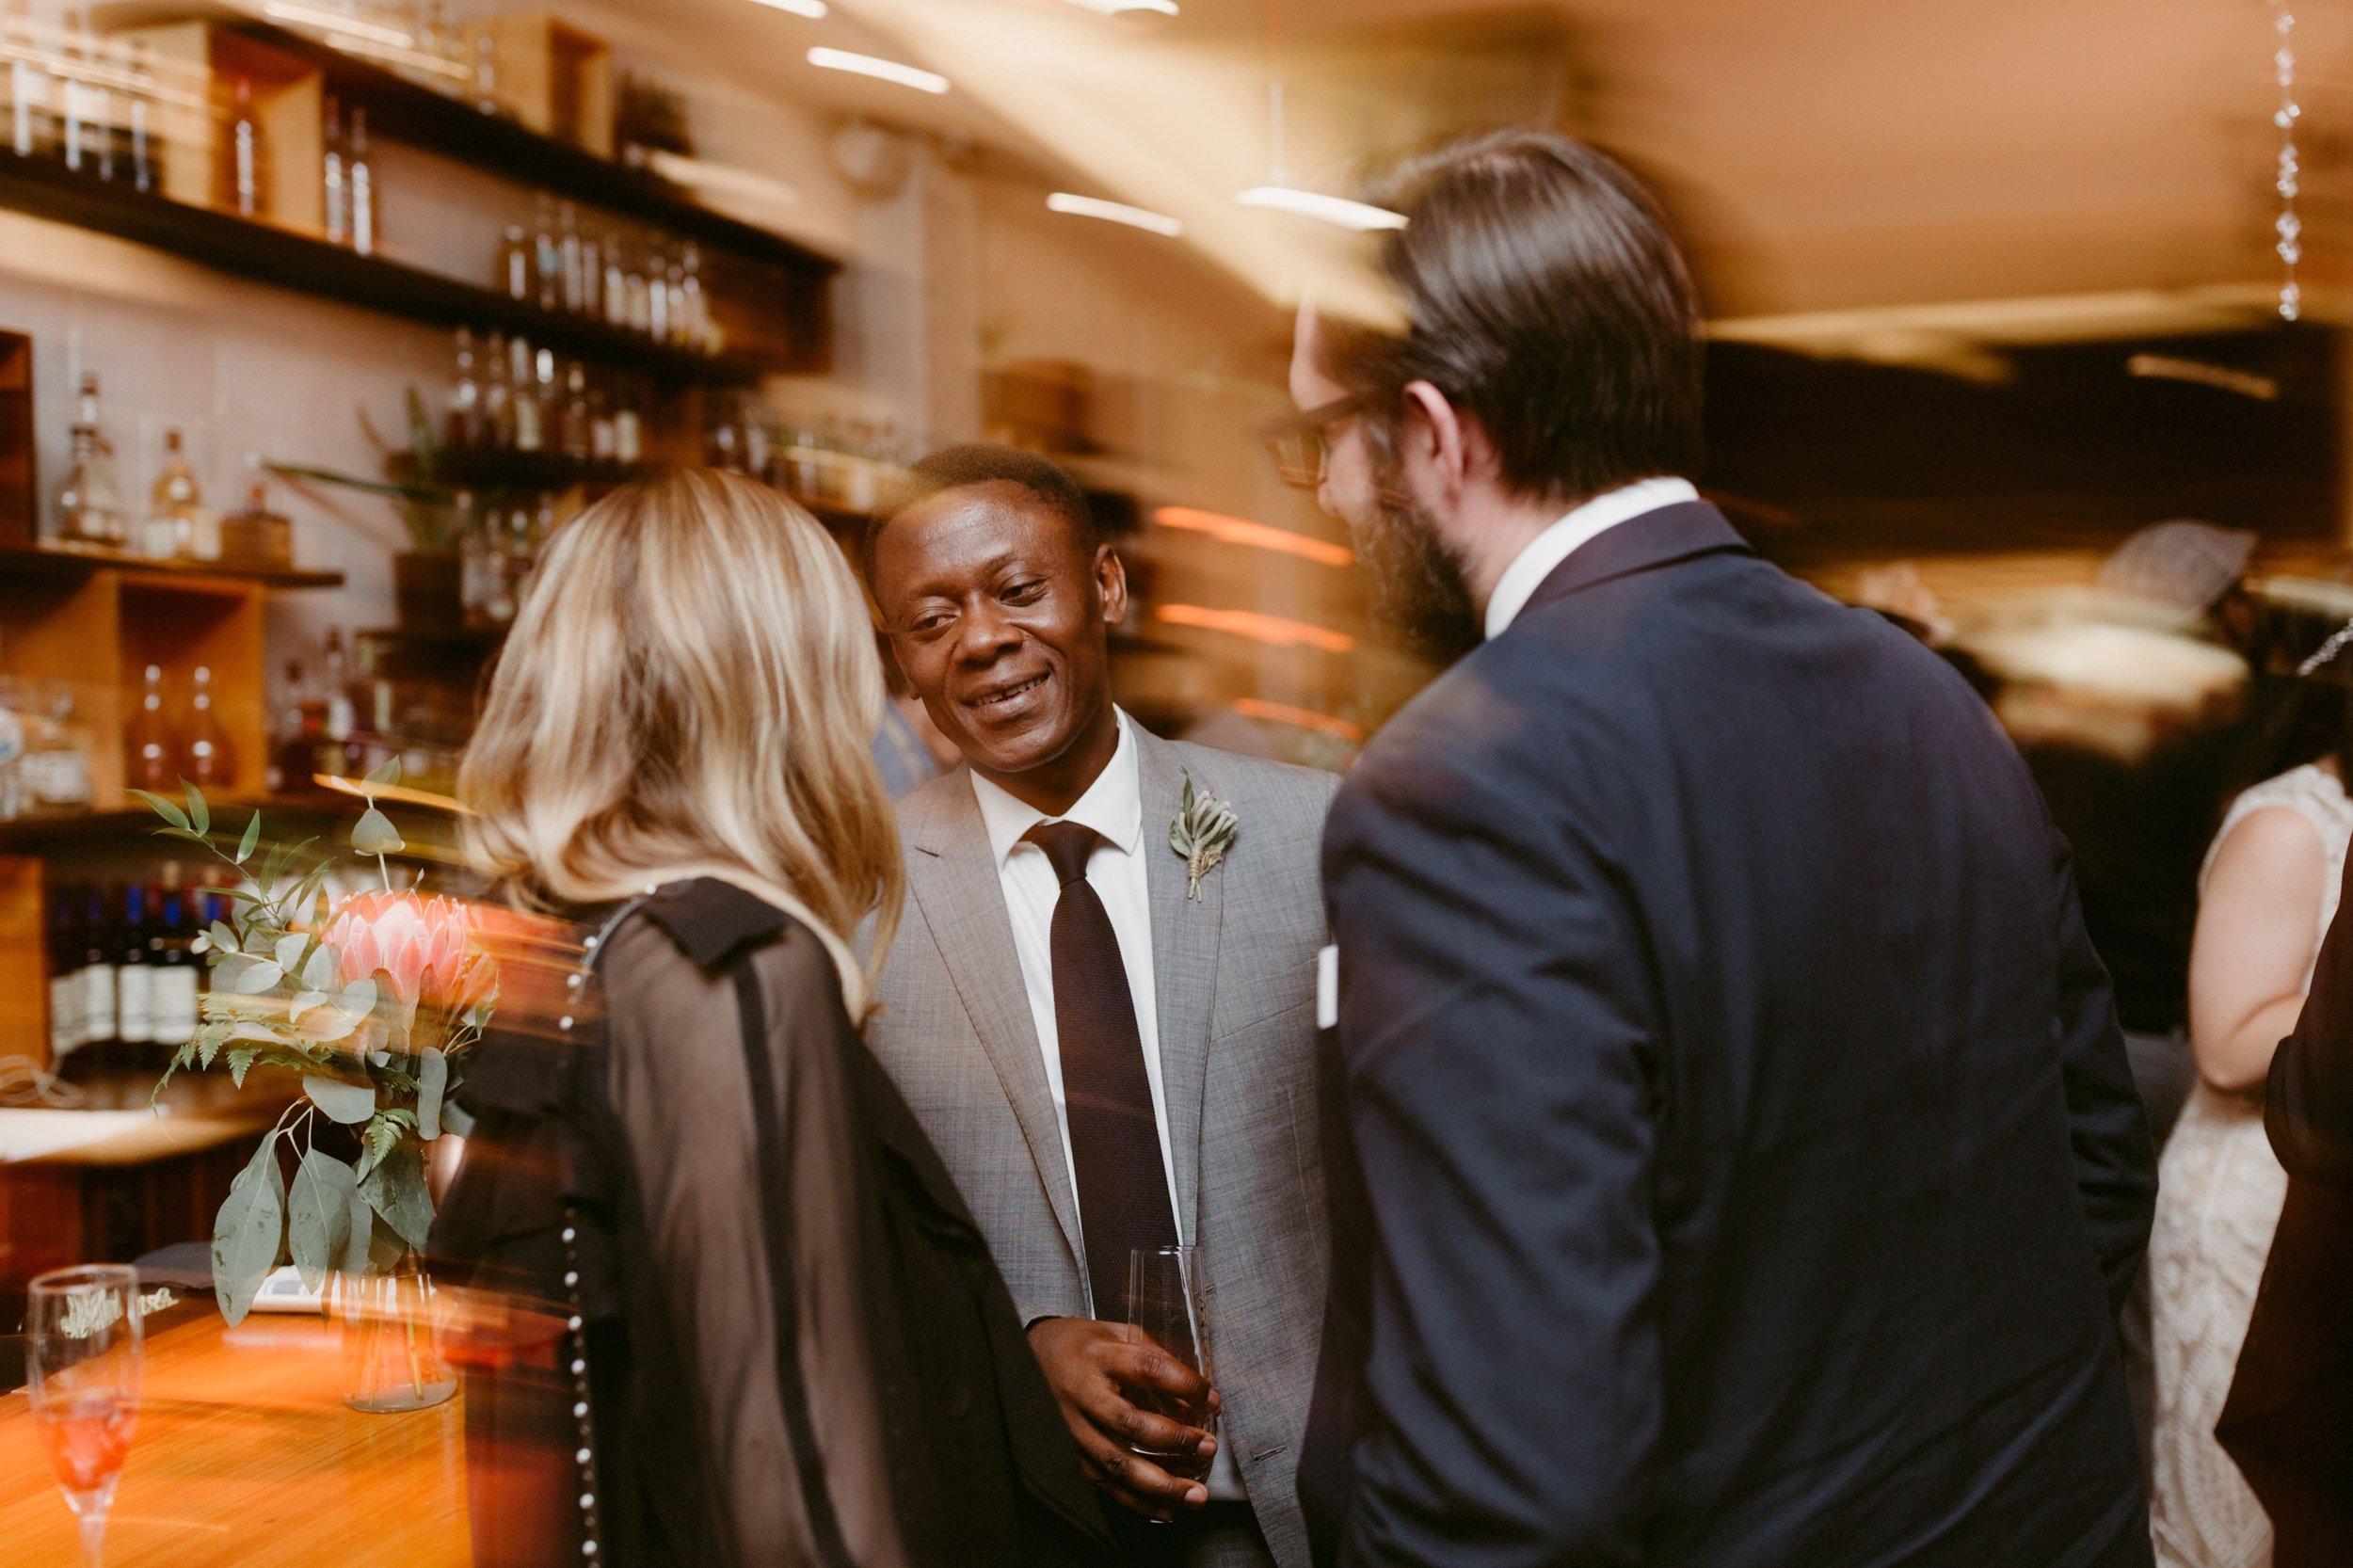 120_Spadina House Wedding (696 of 748)_intimate_Boehmer_Restaurant_Toronto_Wedding.jpg